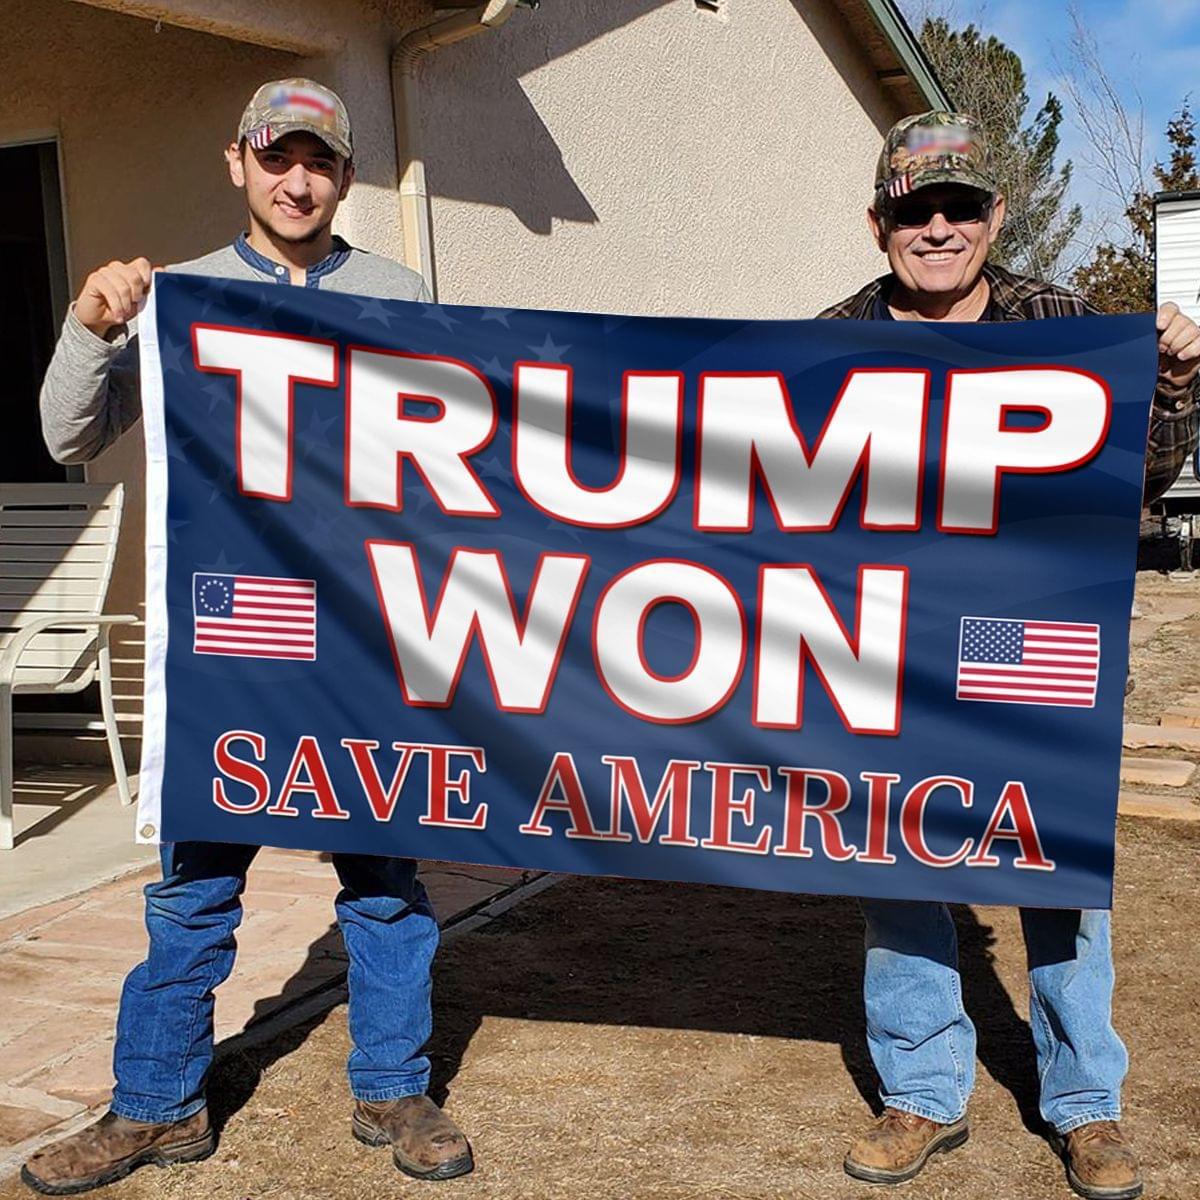 24 Trump won save america Flag 1